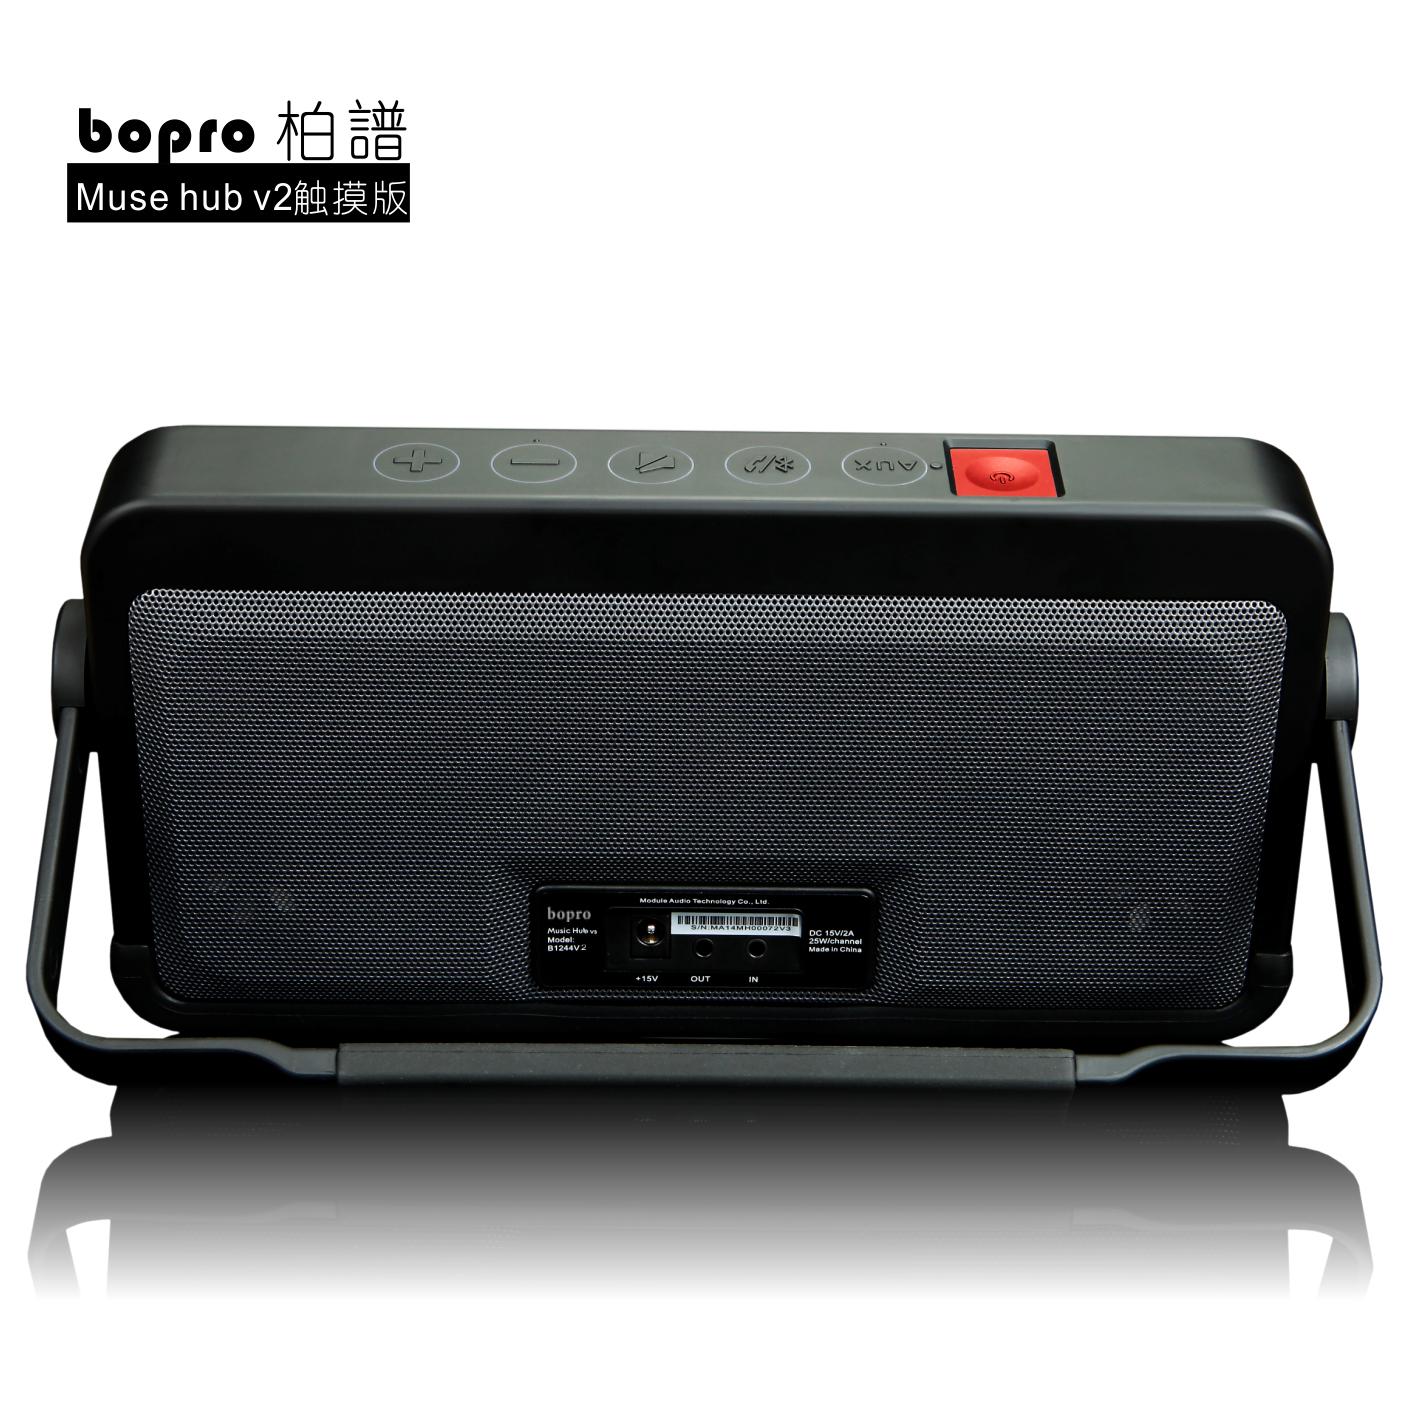 bopro-柏谱 Muse Hub V2迷你无线蓝牙音箱户外小便携音响箱博士